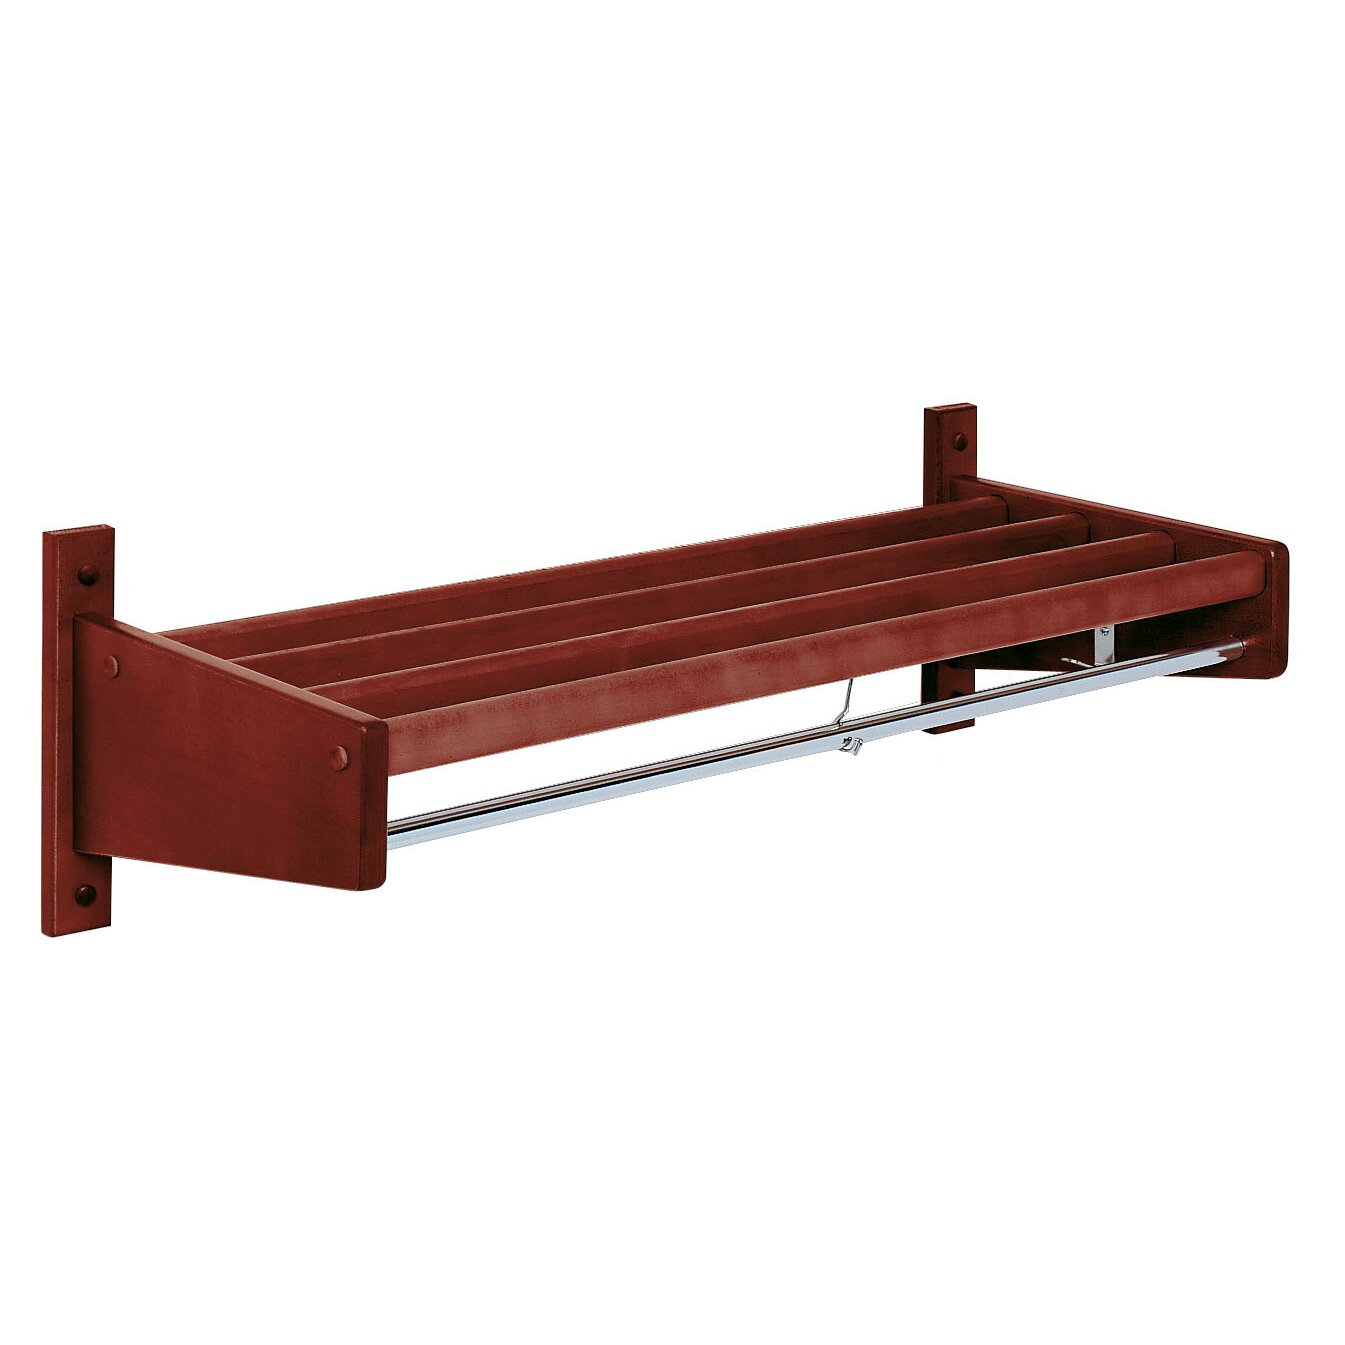 Magnuson Group Wood Slat Design